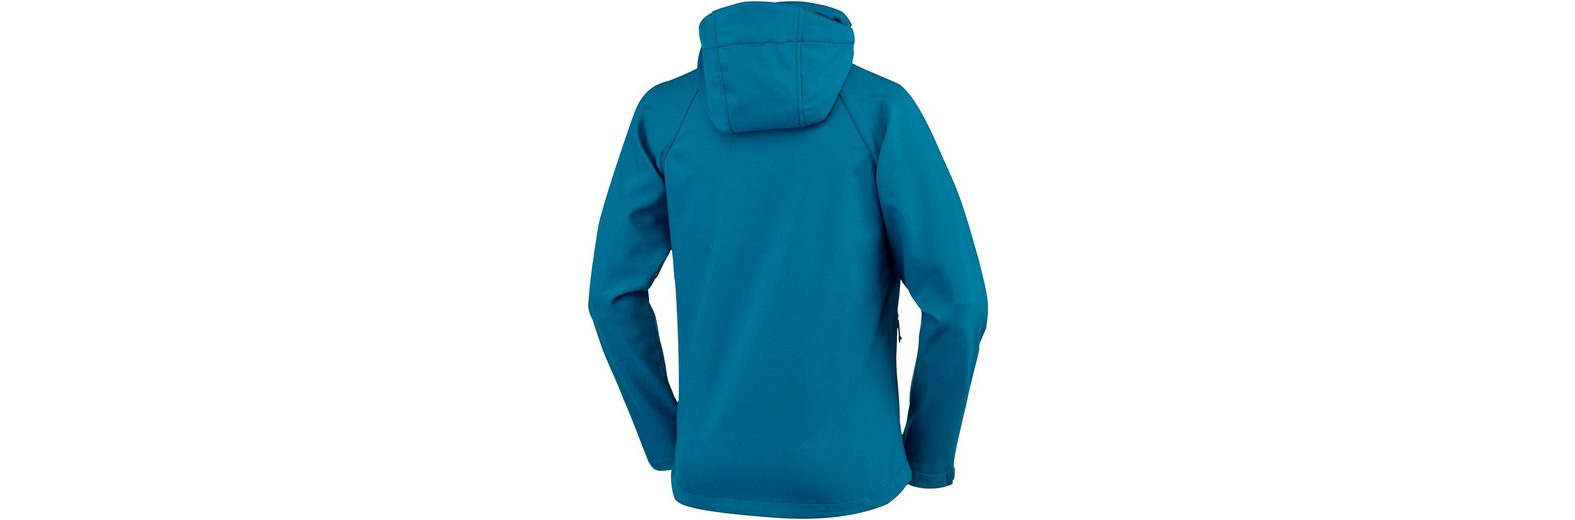 Columbia Outdoorjacke Cascade Ridge II Softshell Jacket Men Billig Verkauf 2018 Neue QkZBW4kV